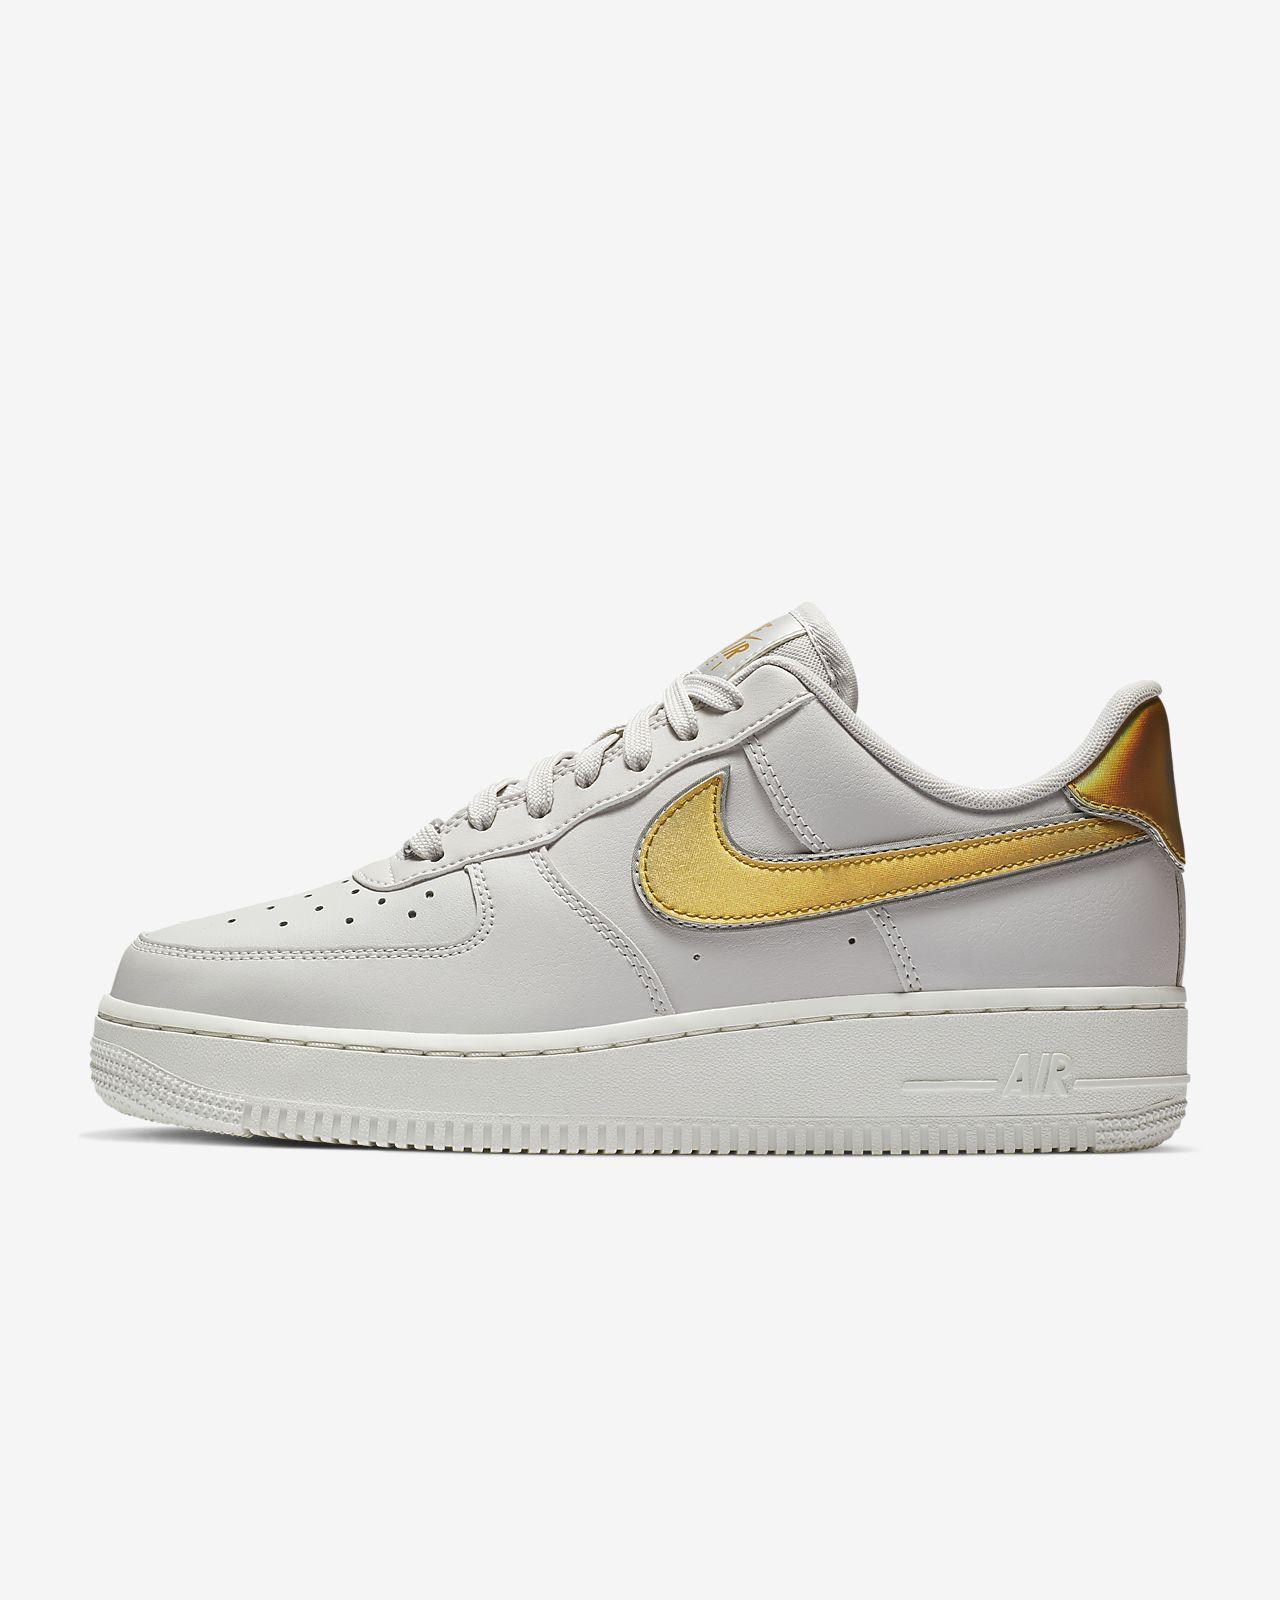 quality design 09fdb 9b50c ... Buty damskie Nike Air Force 1 07 Metallic